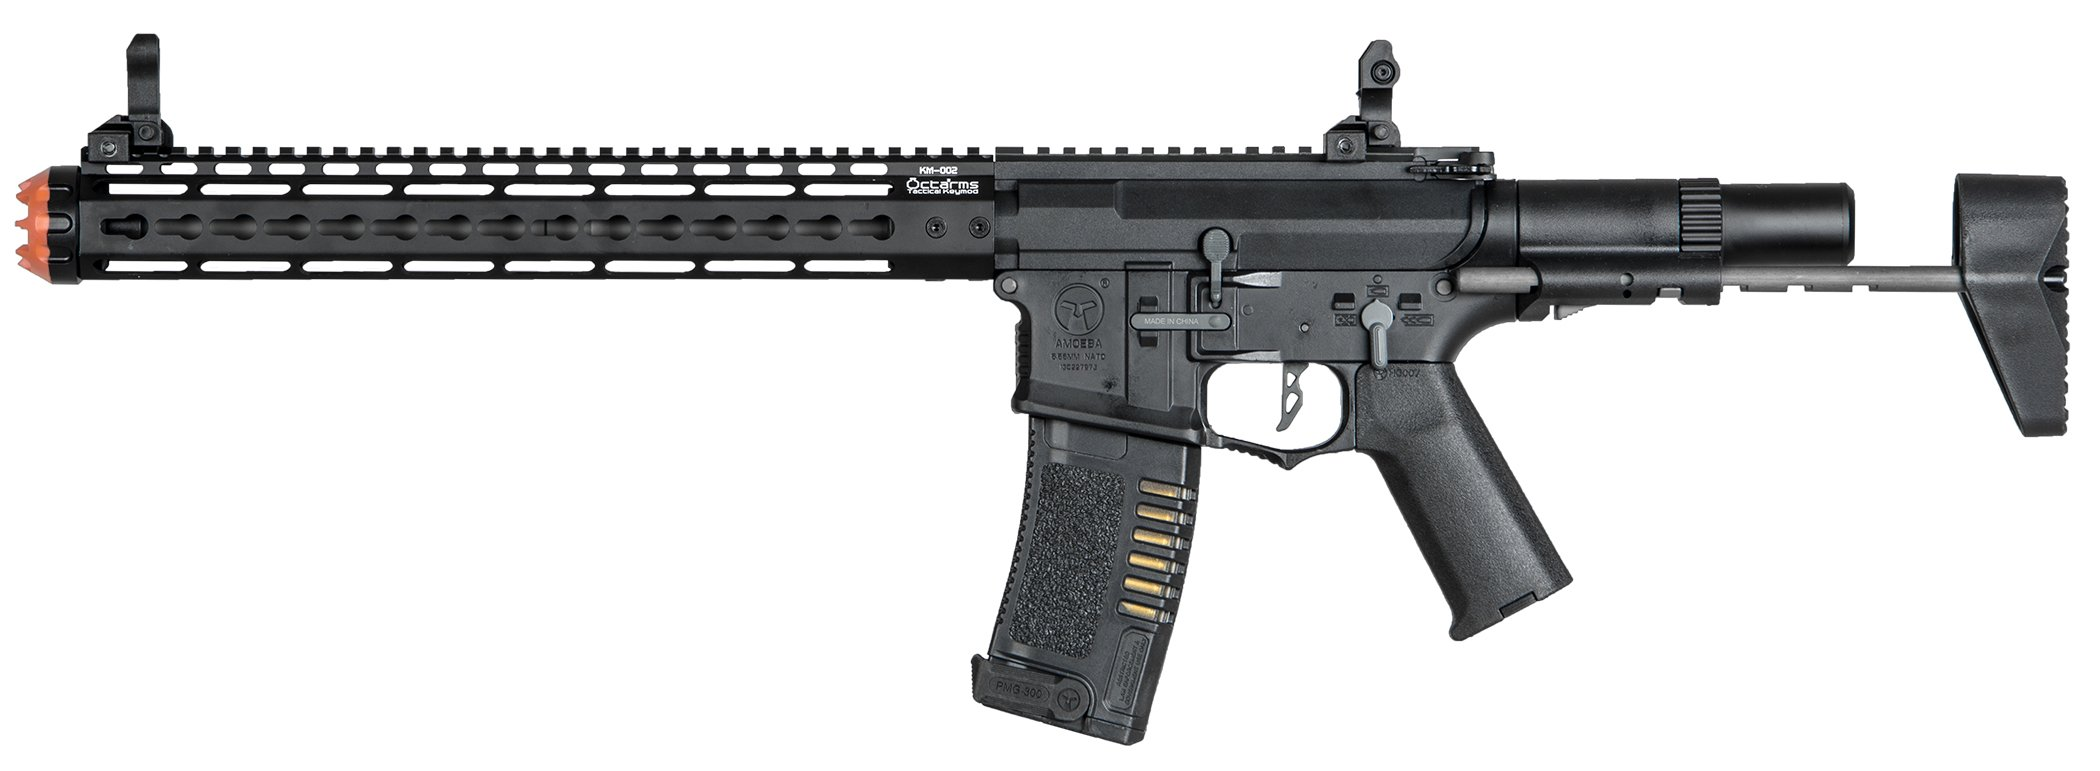 ARES Amoeba AM-016 M4 Carbine - GEN2 (Black)